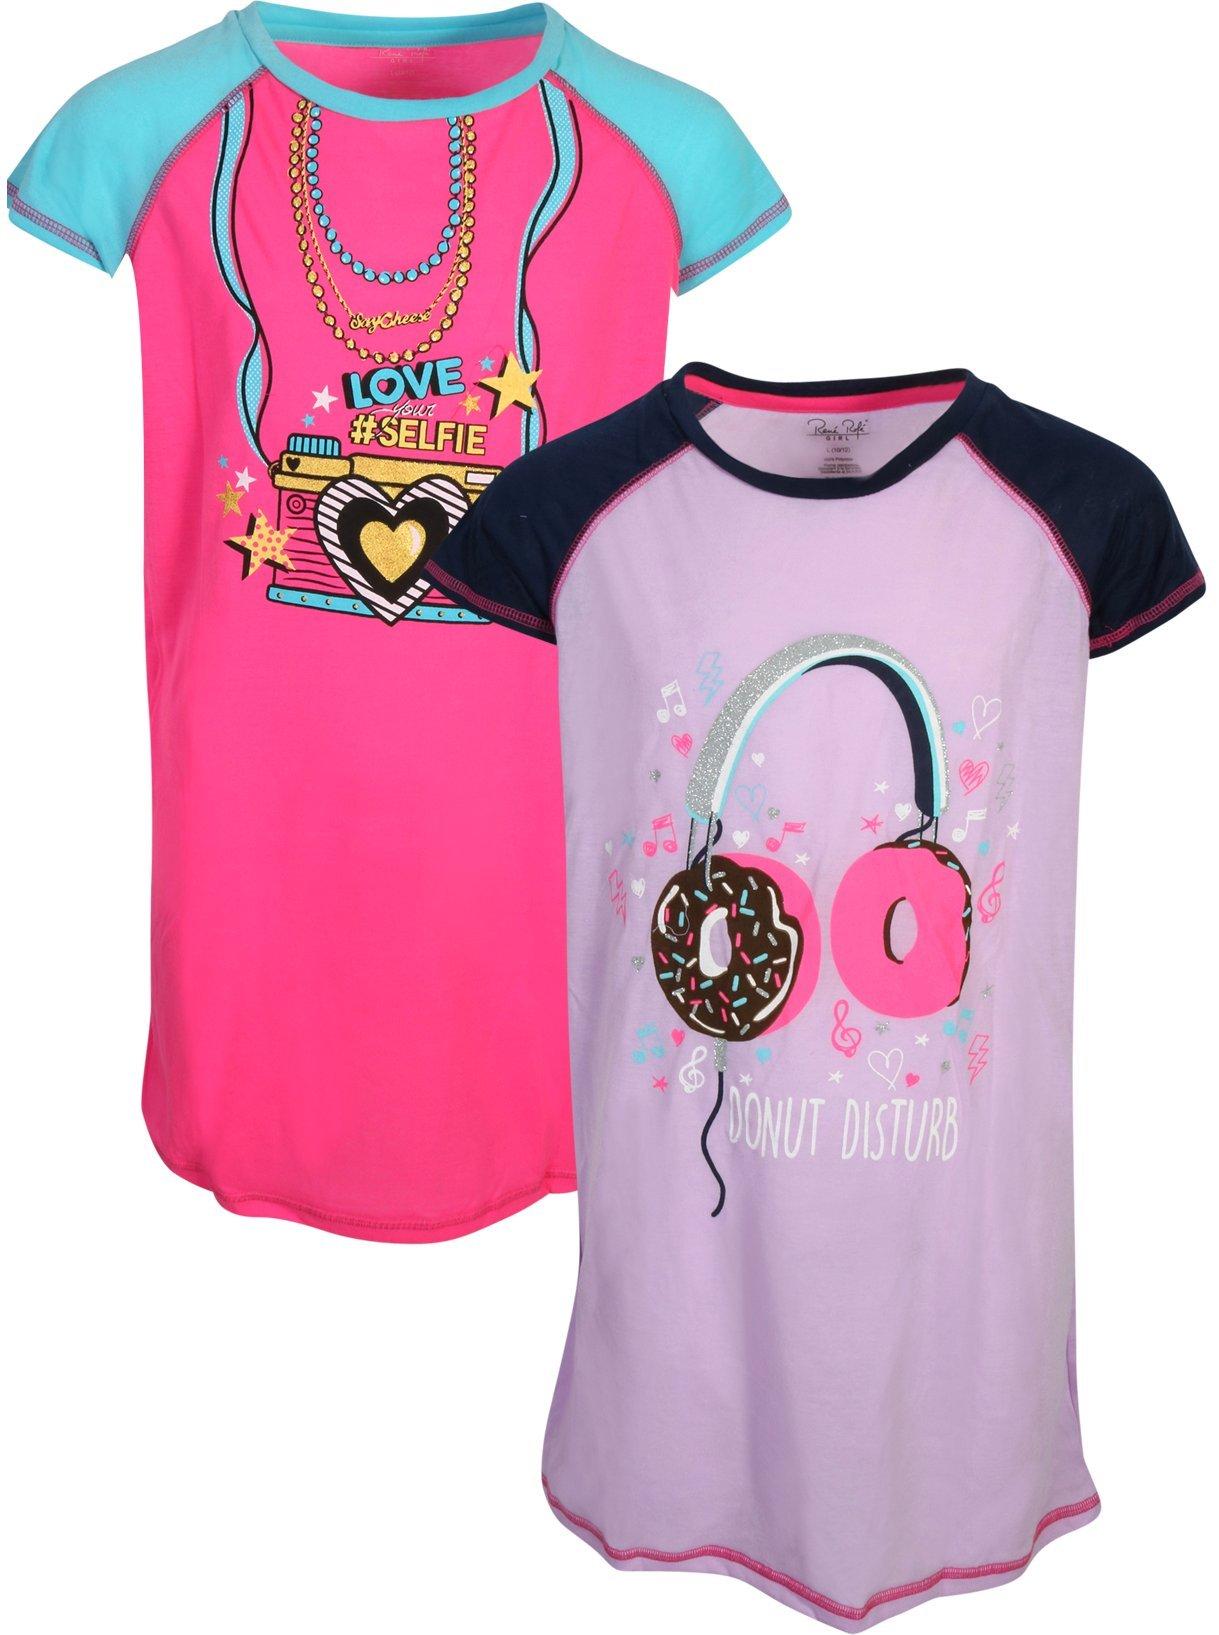 Rene Rofe Girl's Nightgown Pajama Set (2 Pack) Love Selfie/Donut Disturb, X-Small- 4/5'